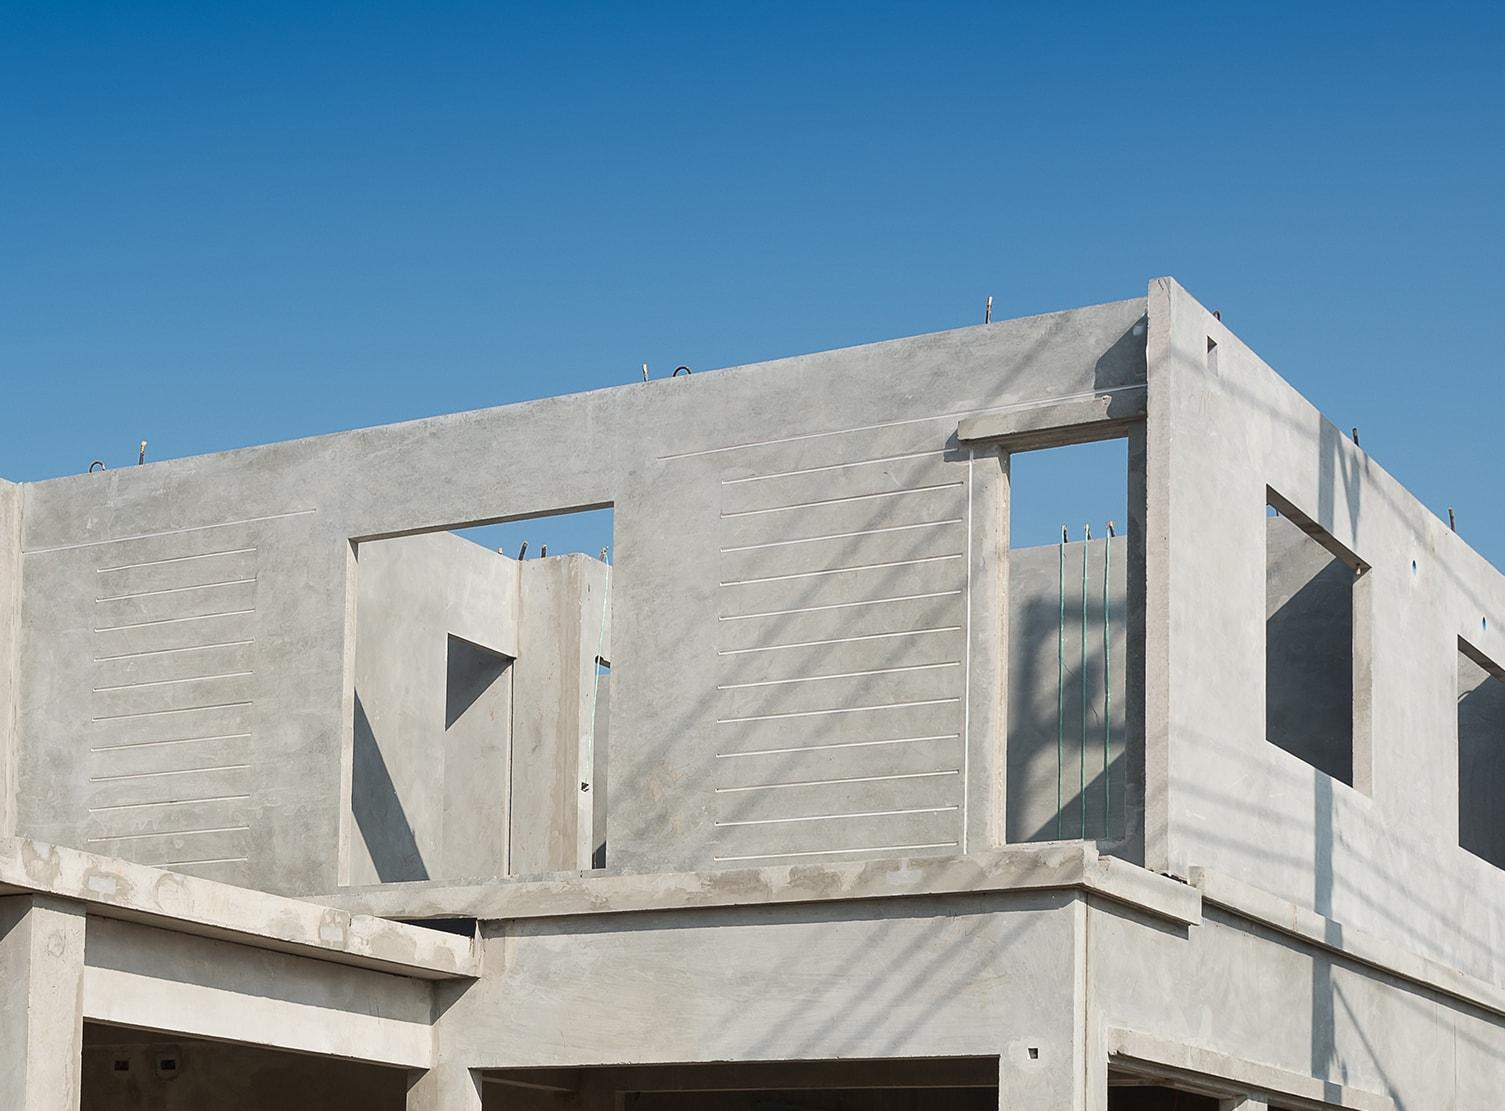 home built of architectural precast concrete